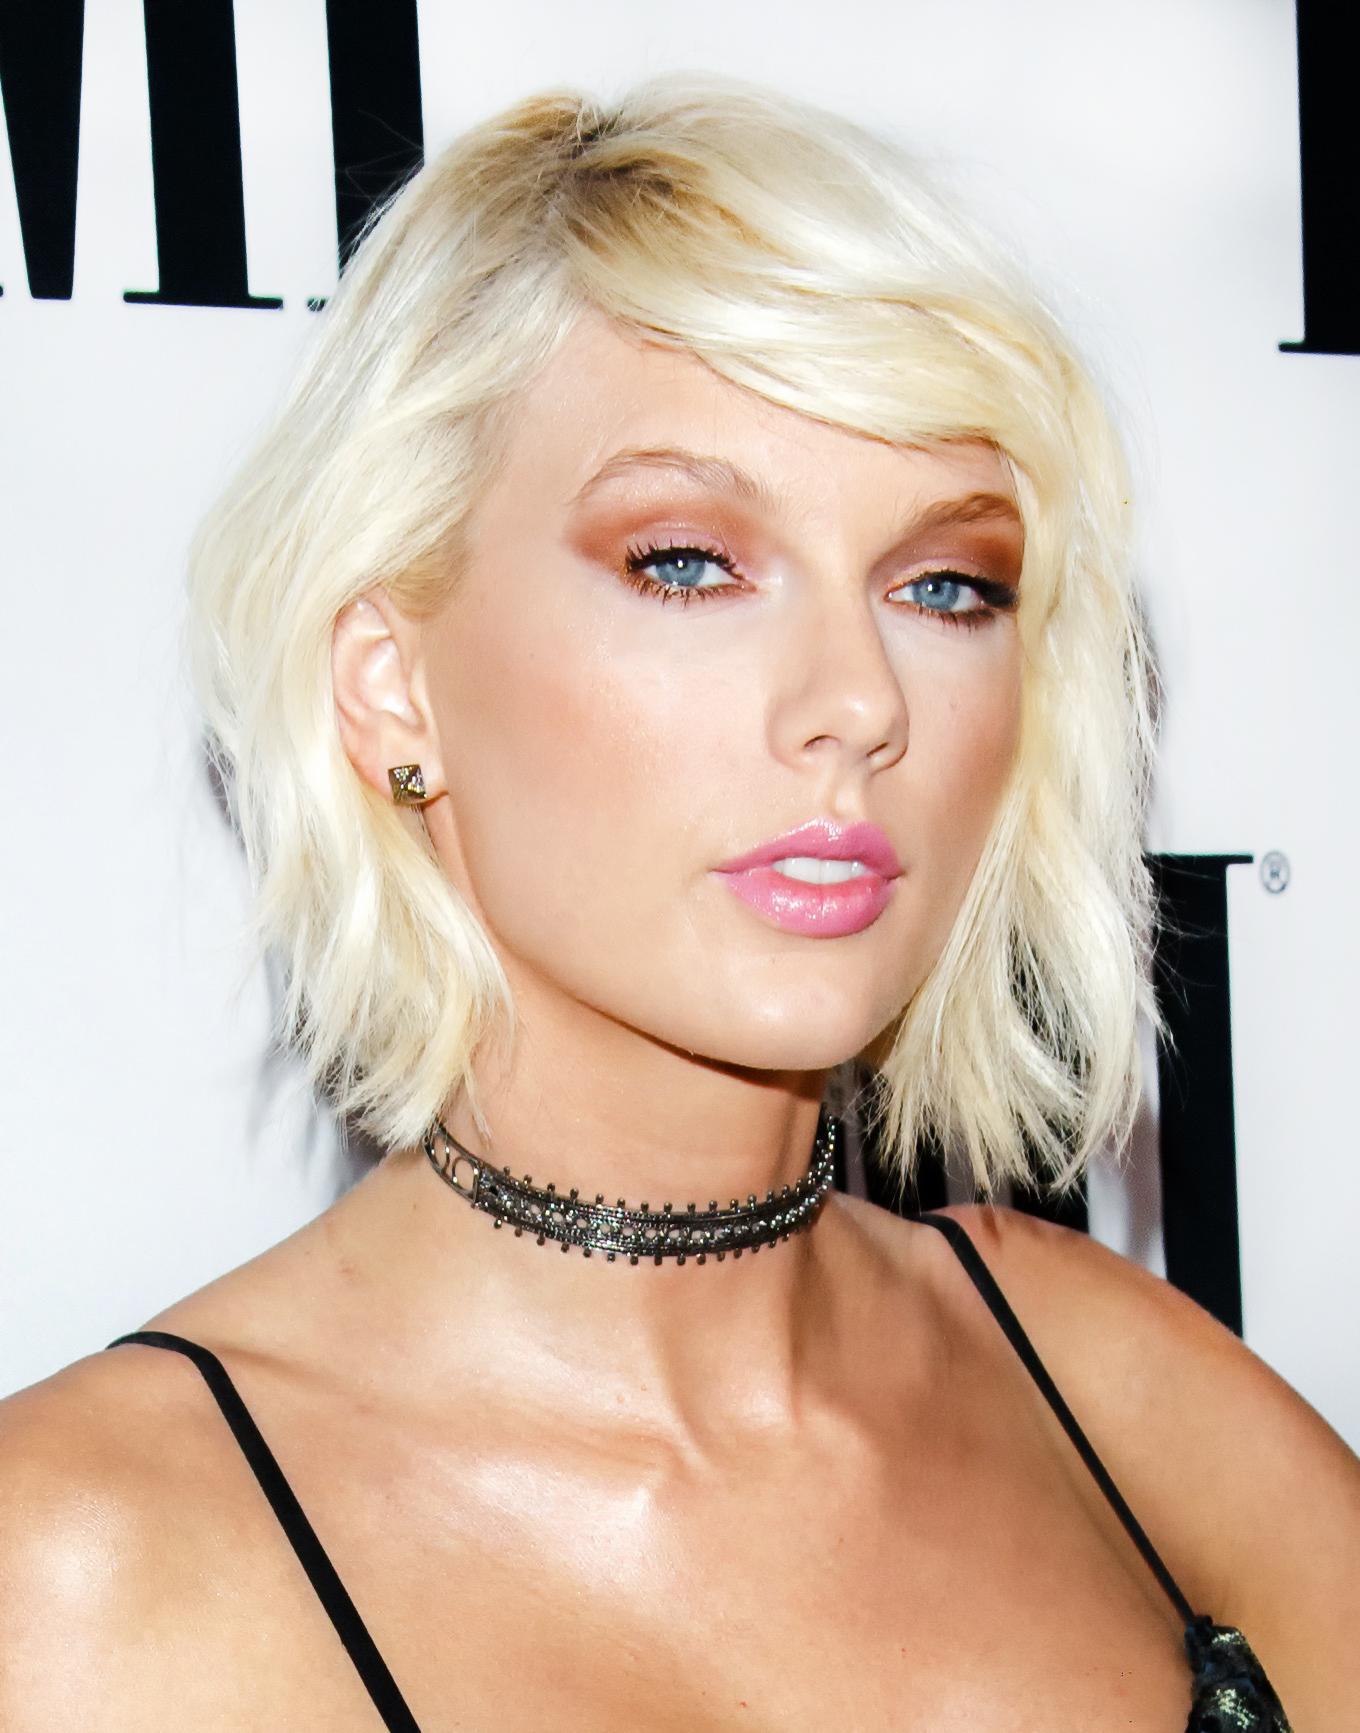 Taylor Swift's new song lyrics